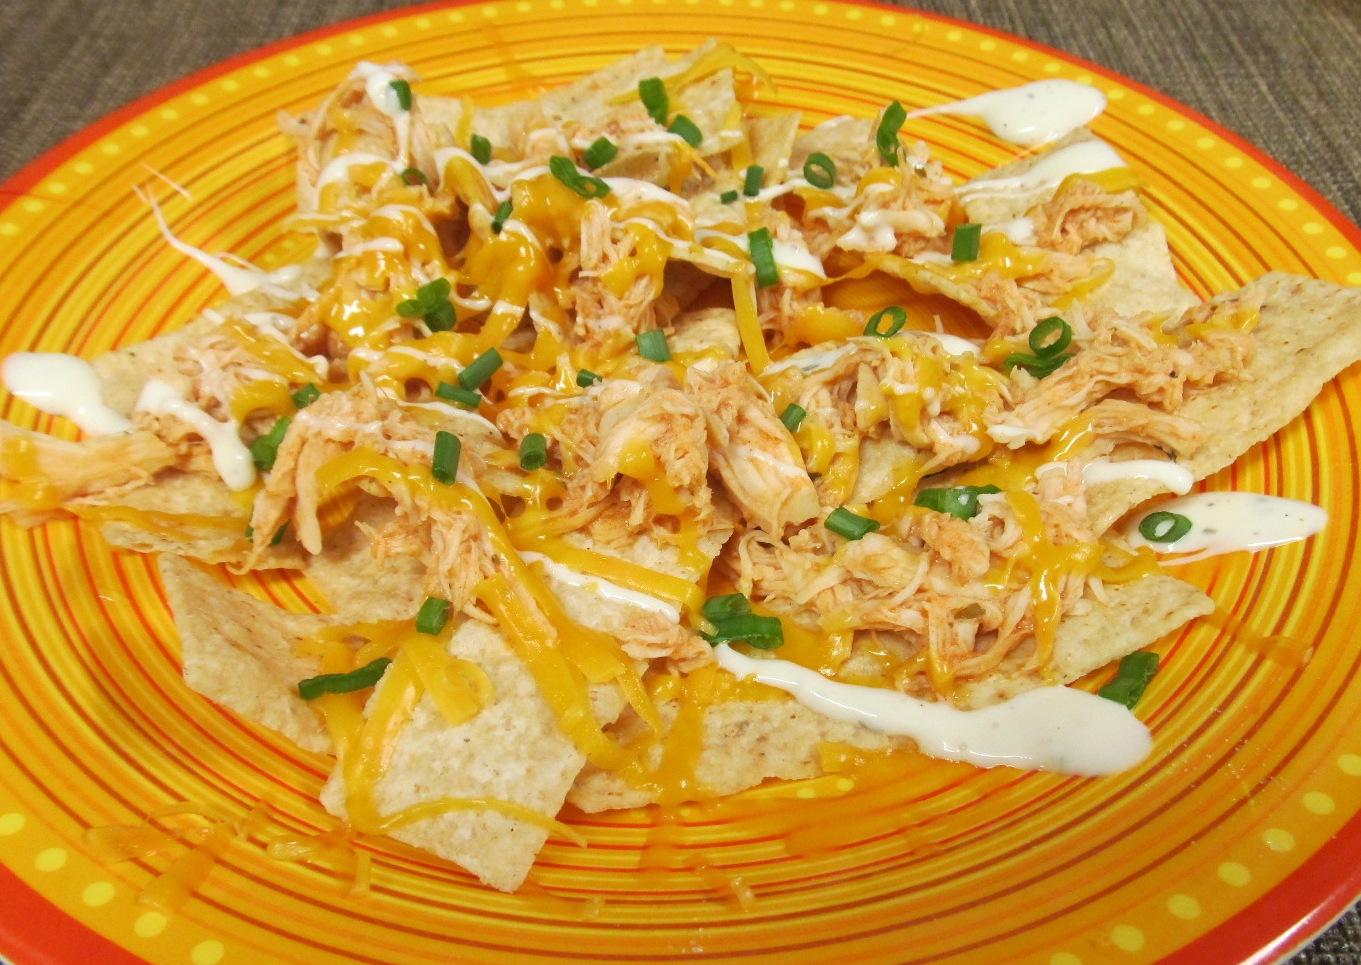 ... Healthy & Low Calorie: Slow Cooker Buffalo Chicken Nachos or Tacos